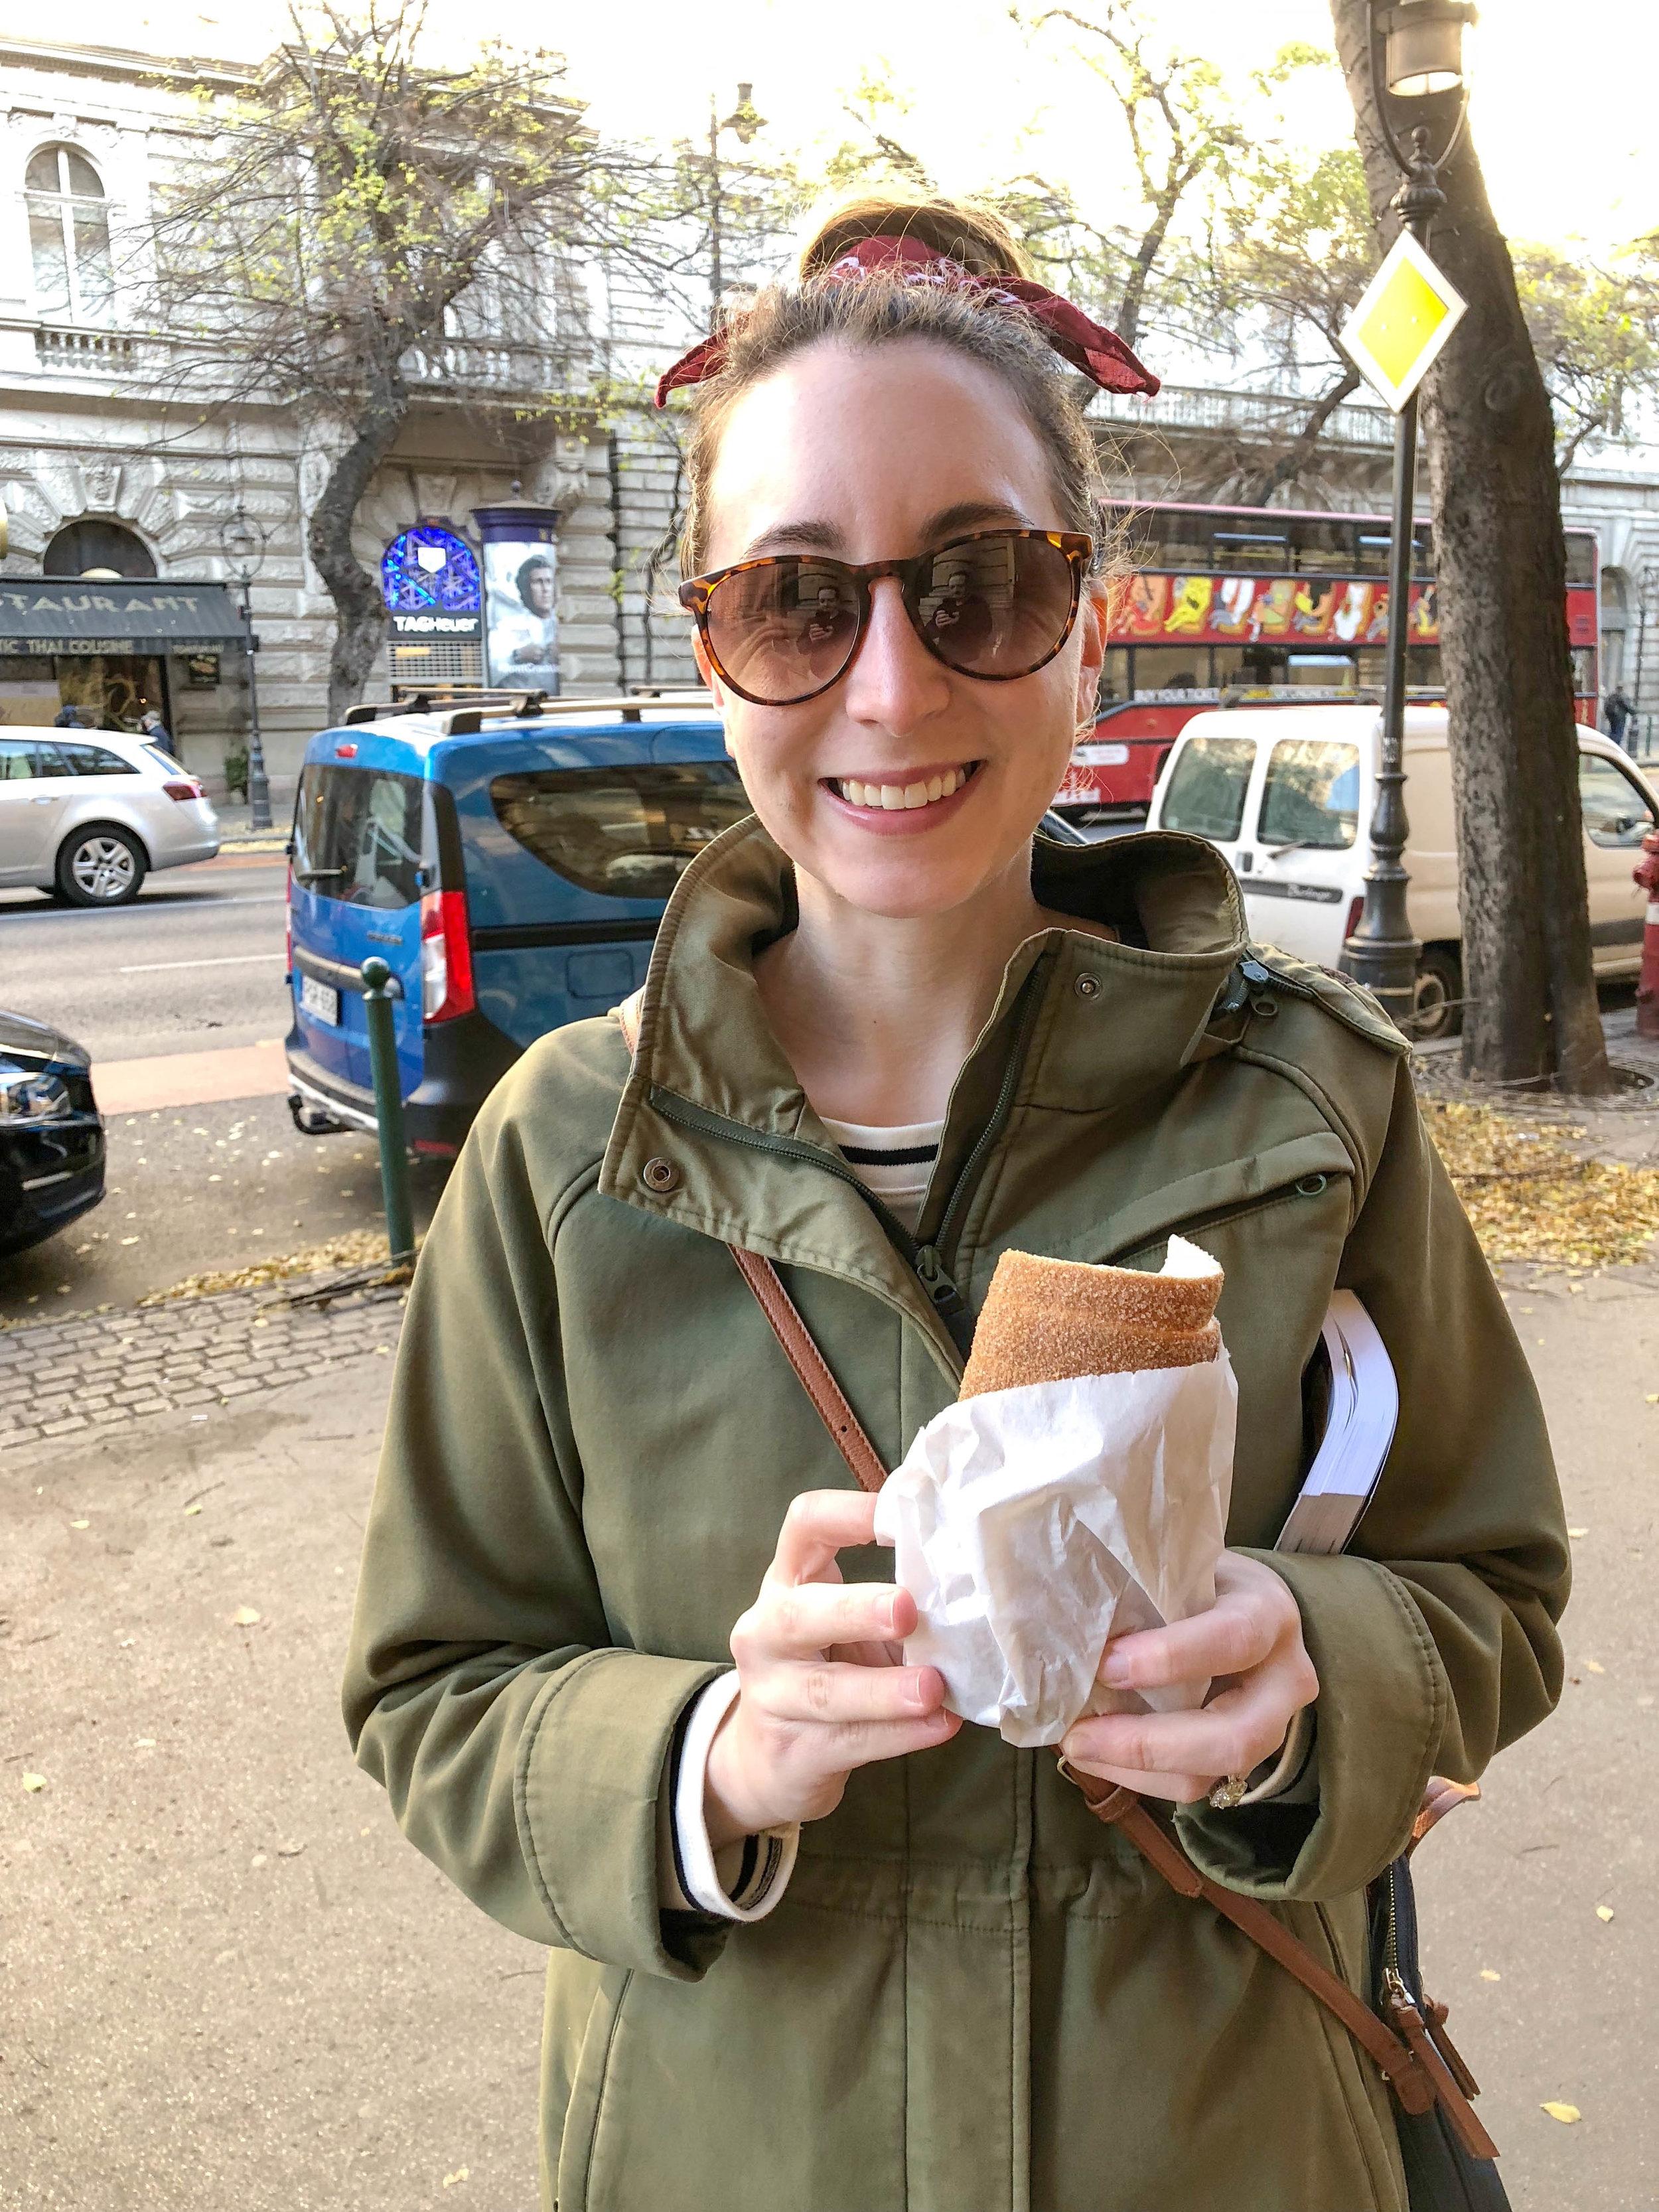 budapest hungary travel guide chimney cake